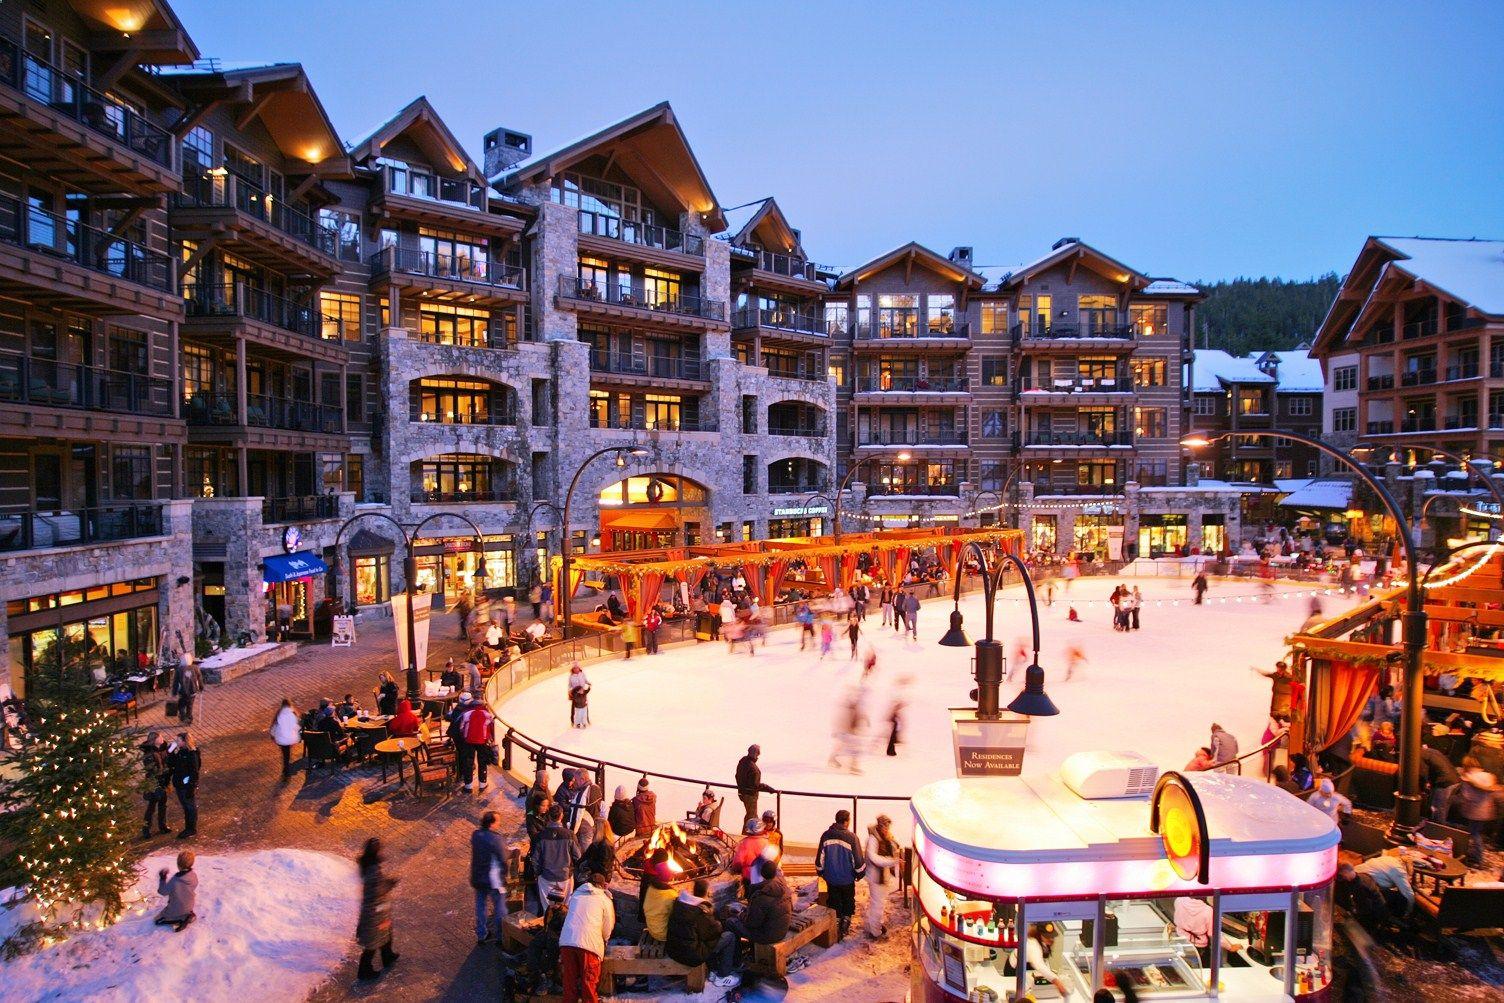 lake tahoe north star ski resort ice skating rink. | other | skiing